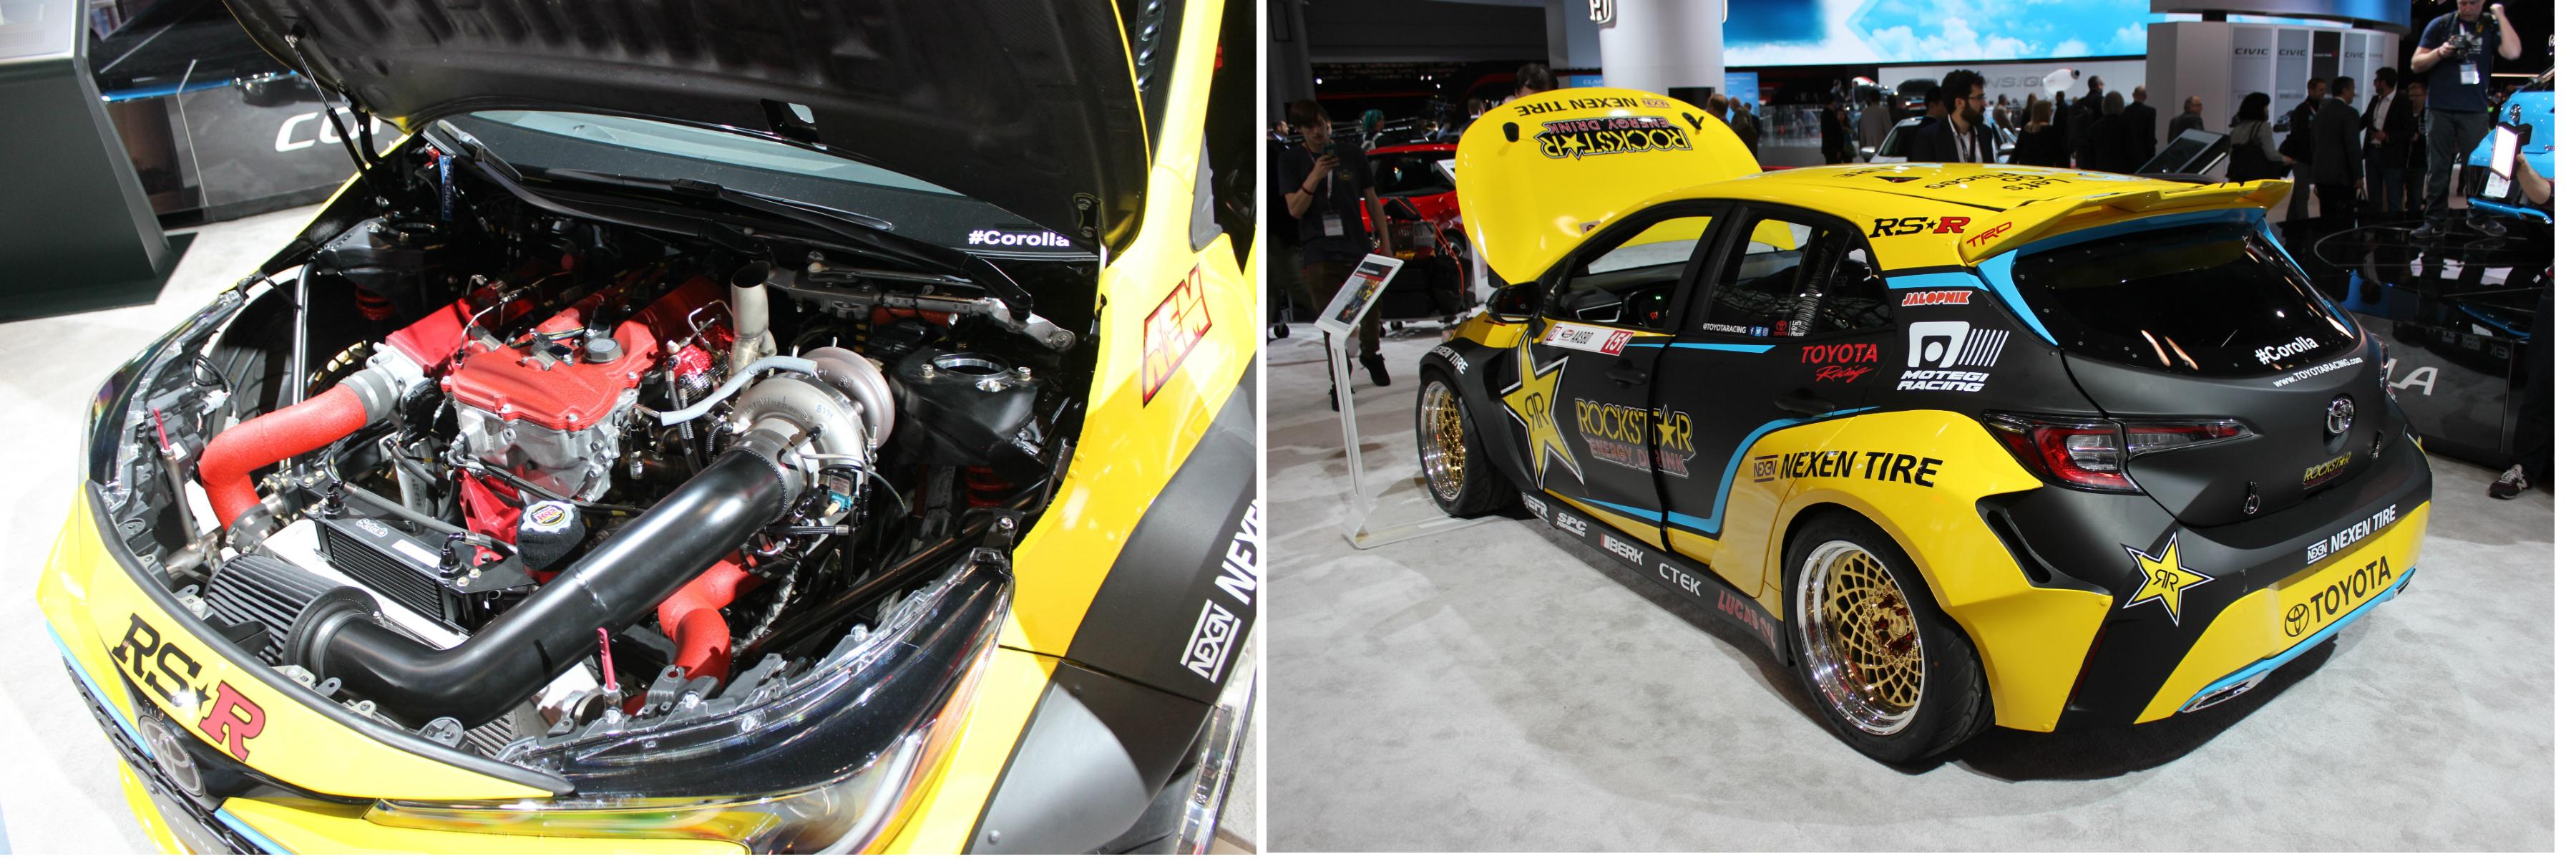 New York International Auto Show Gallery